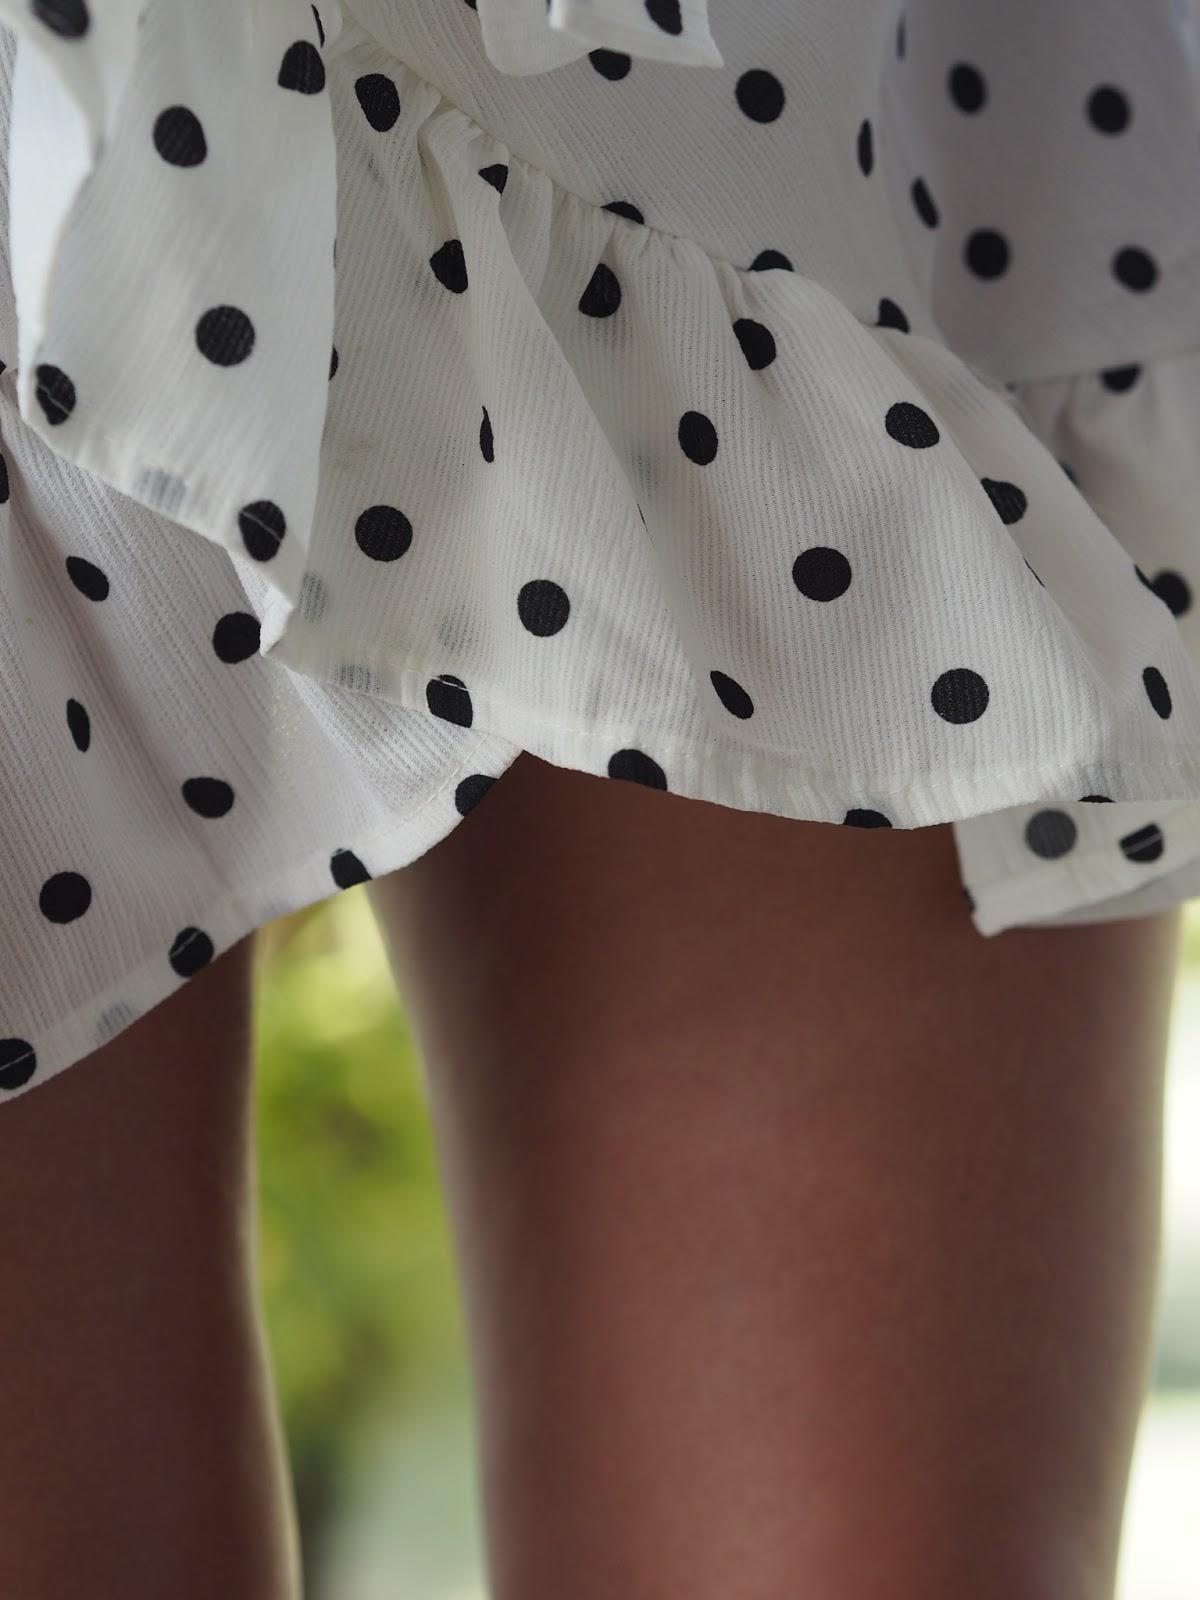 Shein Polka Dot Wrap Dress Ruffles and Legs